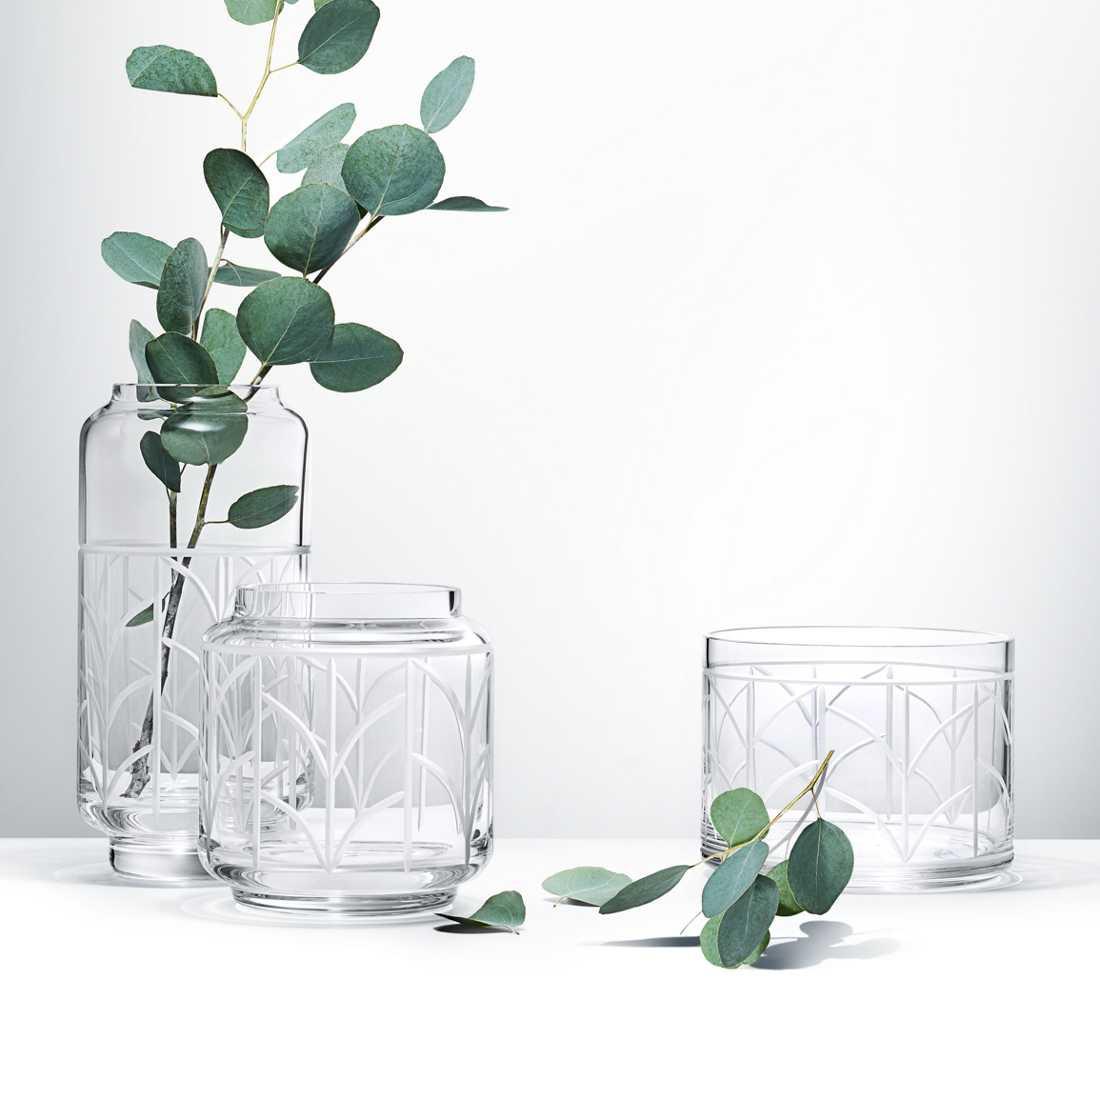 Tiffany and Co Glass Vase Of Tiffany Blue Vases Vase and Cellar Image Avorcor Com for Wheat Leaf Baer Vase In Crystal Gl Large Tiffany Co